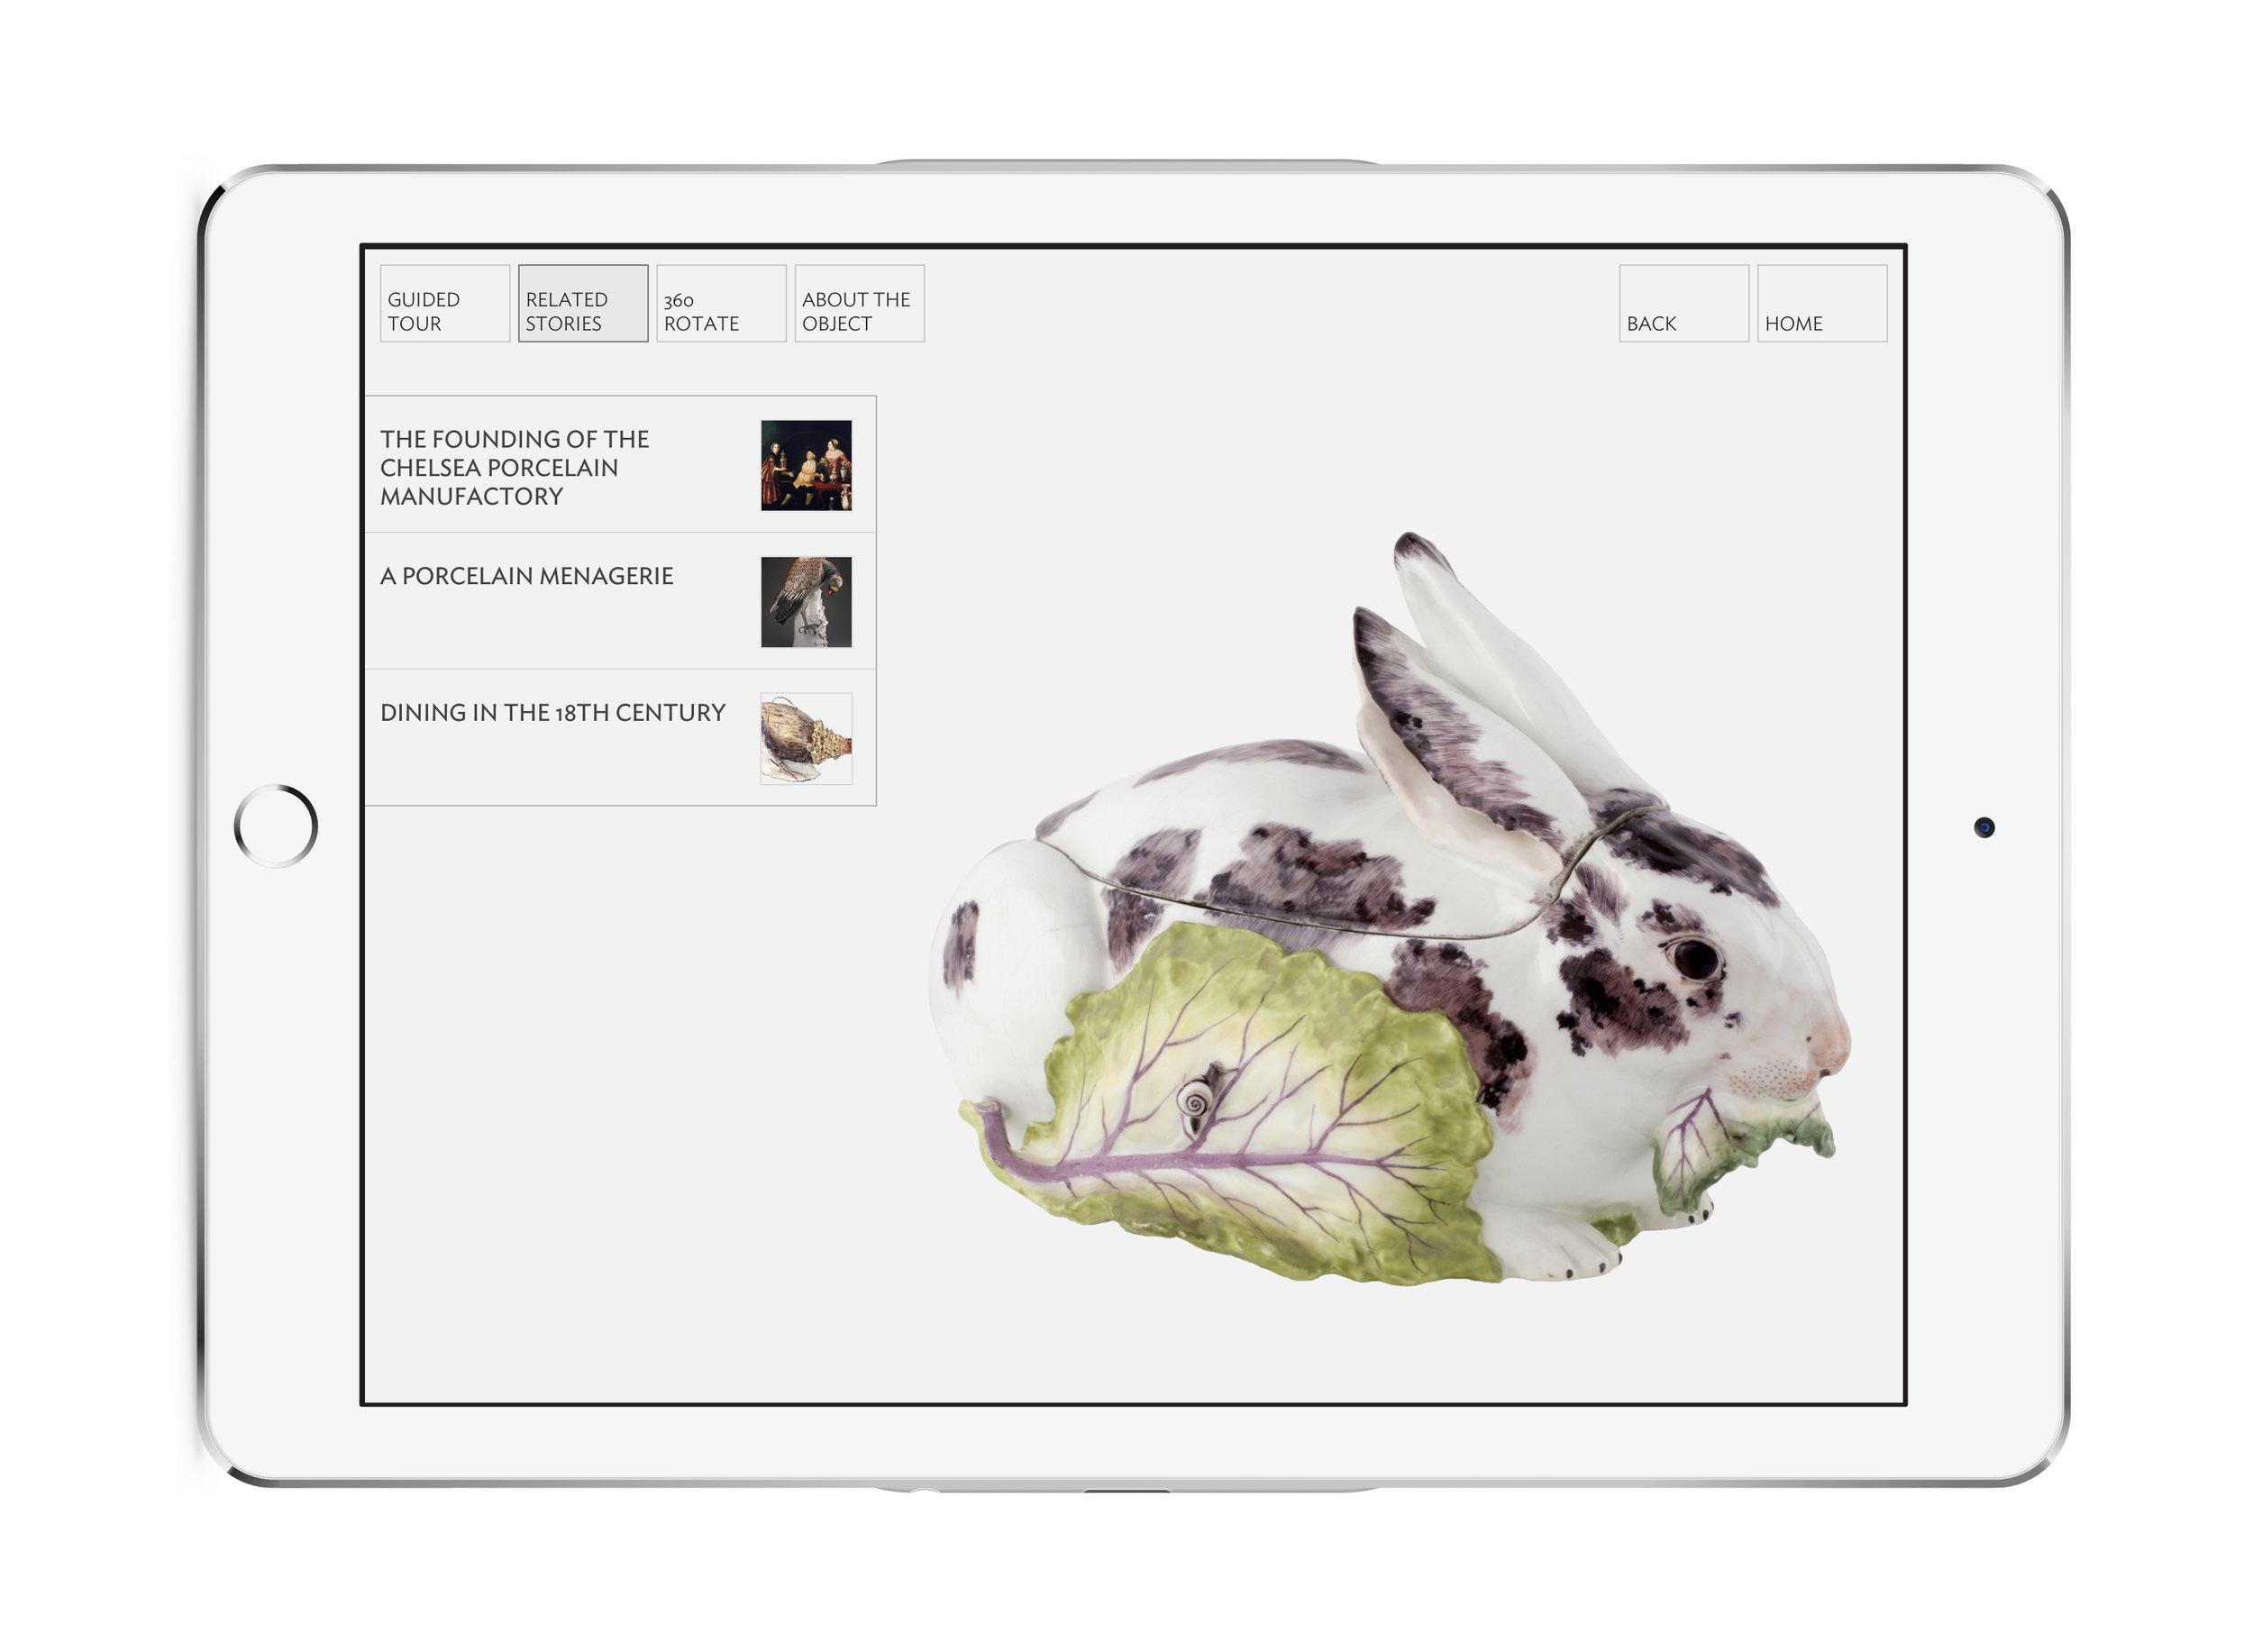 5aic-iPad-relatedstories.jpg